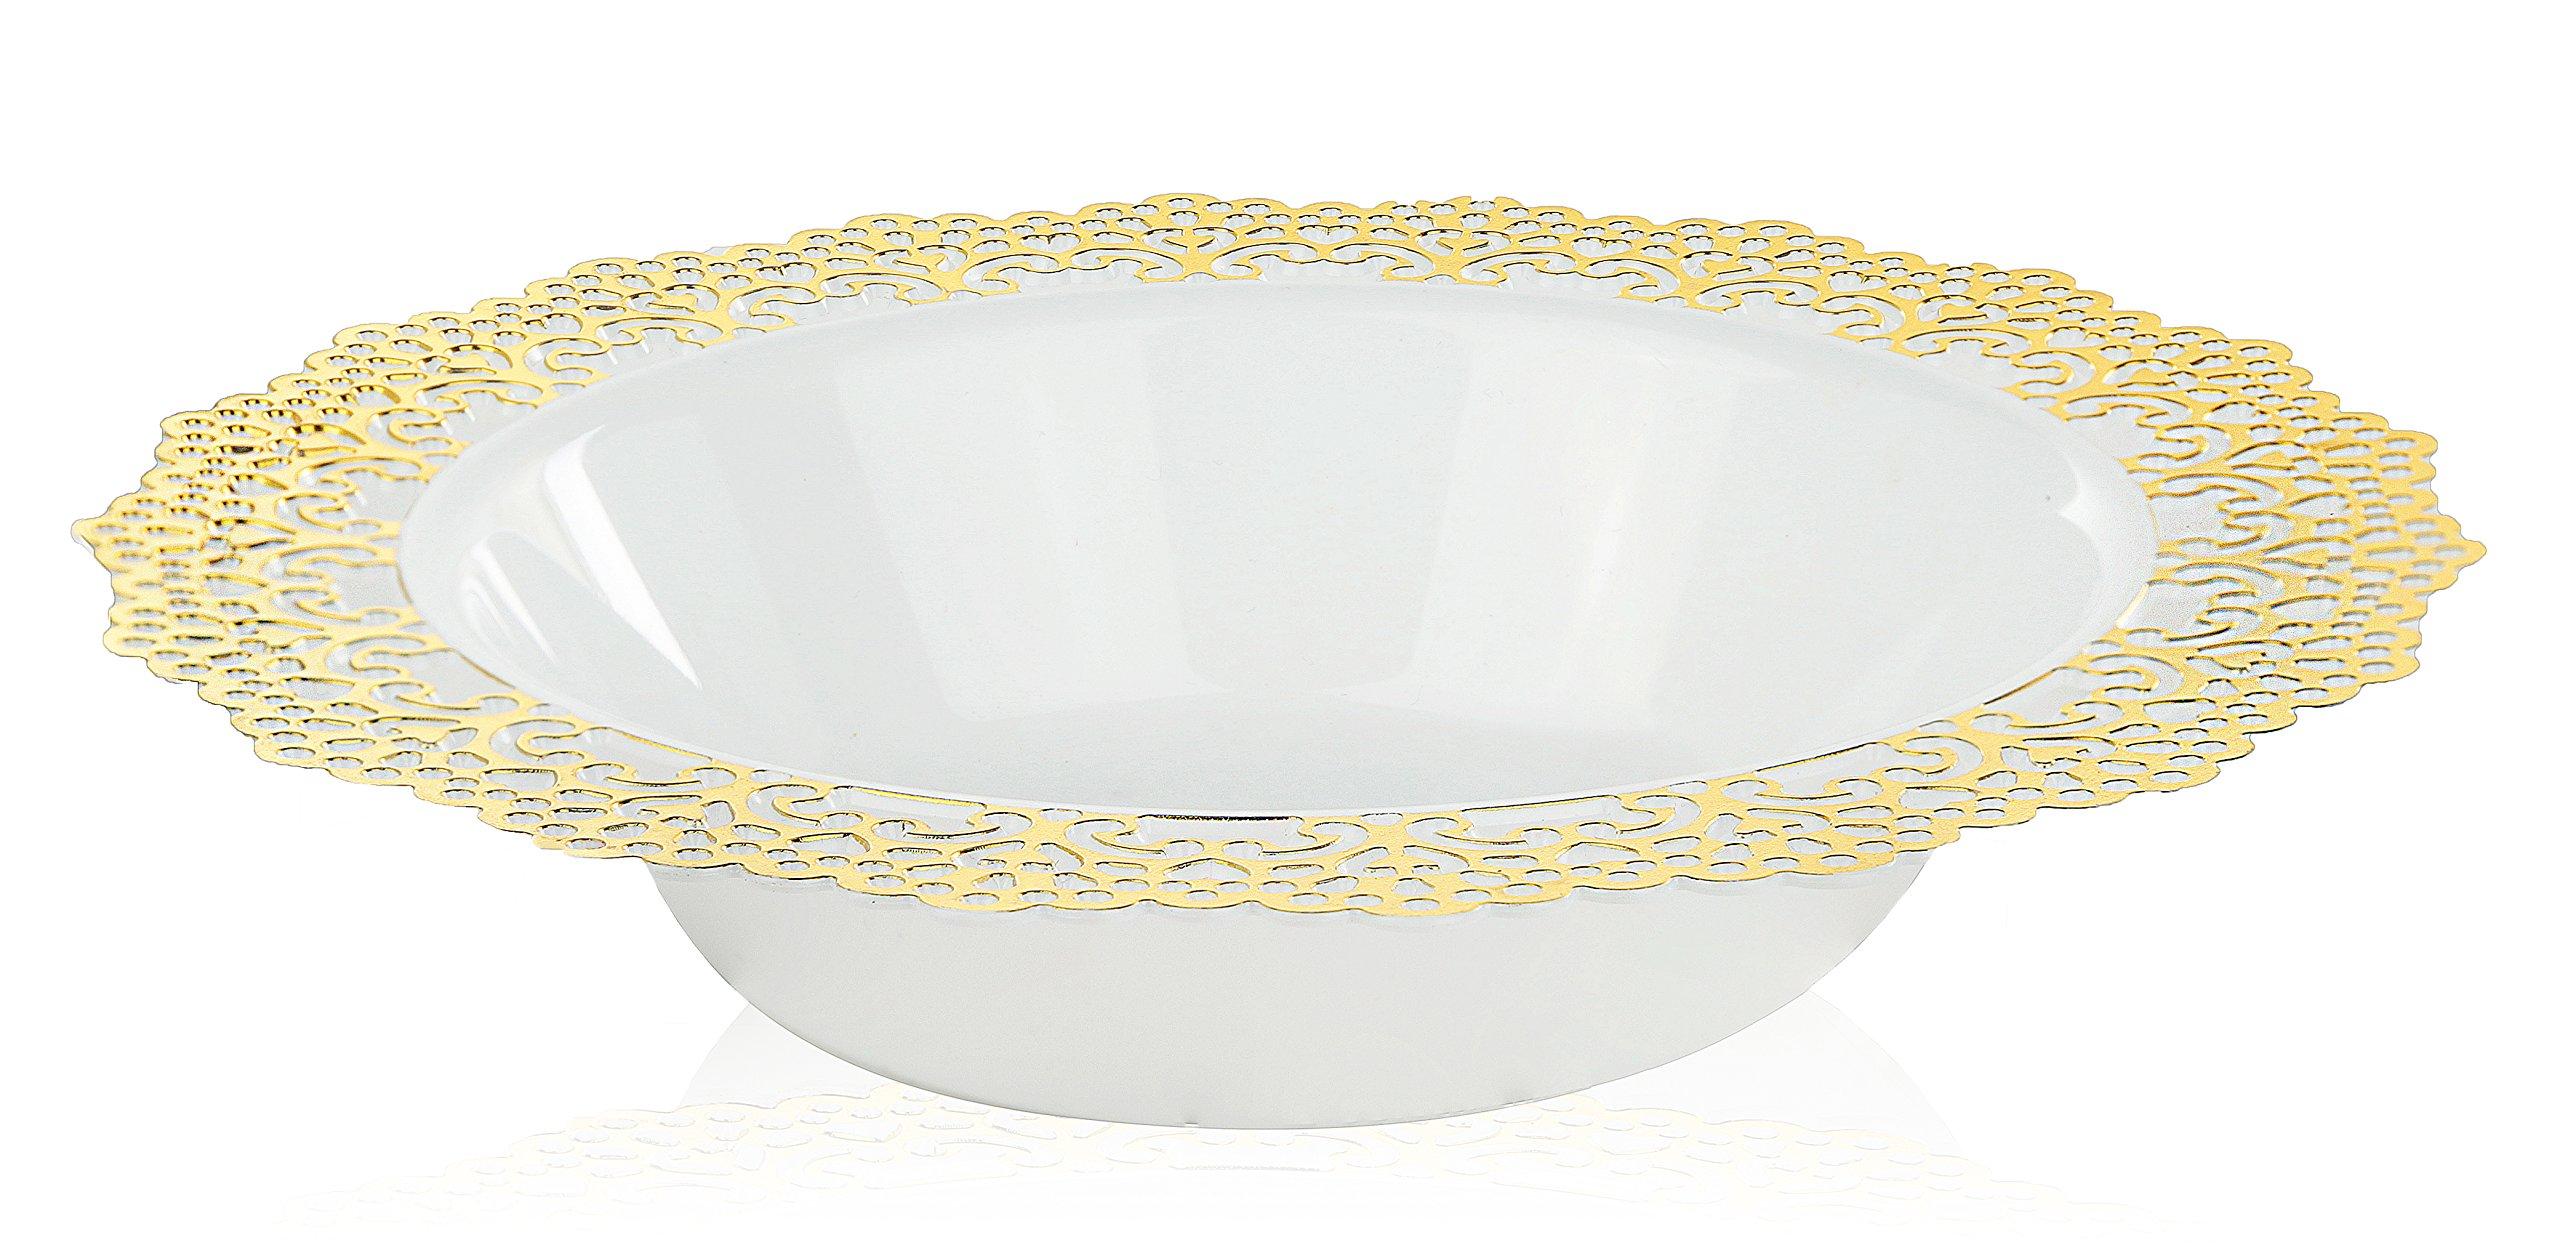 elegant disposable plastic dinnerware plates white bowl with gold lace trim hard u0026 reusable